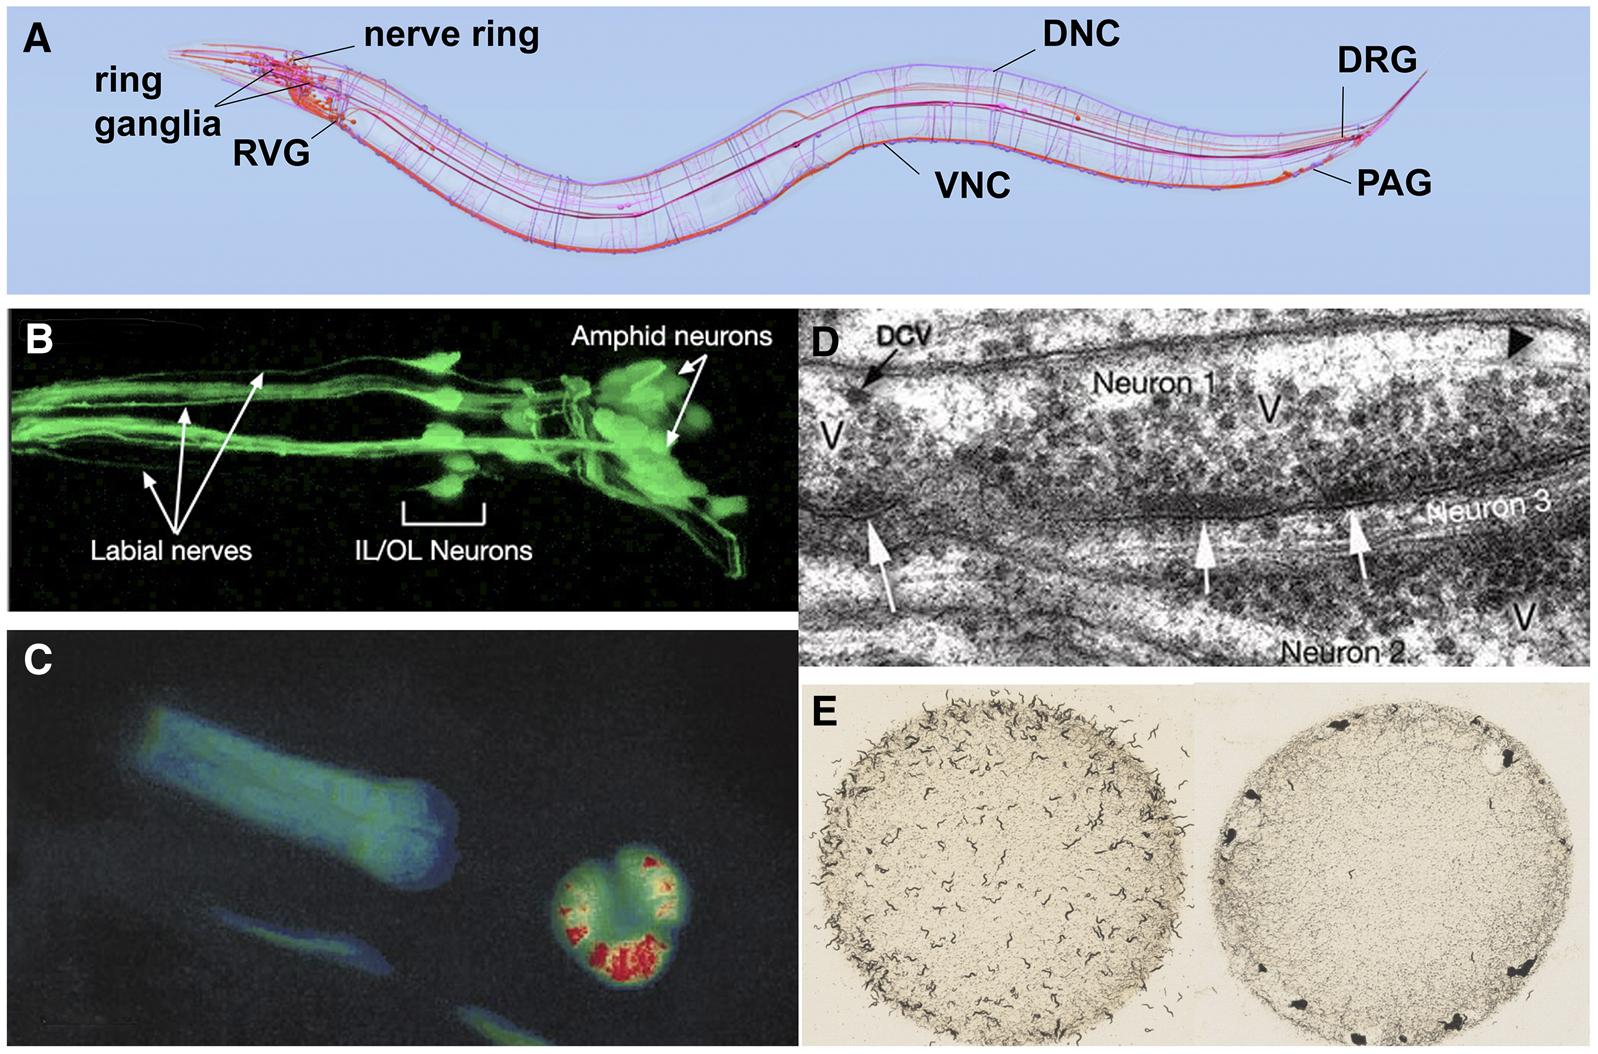 A Transparent Window Into Biology Primer On Caenorhabditis Elegans Prokaryotic And Eukaryotic Cells Diagram The Greatest Garden Figure 4 Anatomy Study Of C Nervous System Identifying Some Major Nerve Bundles Ganglia